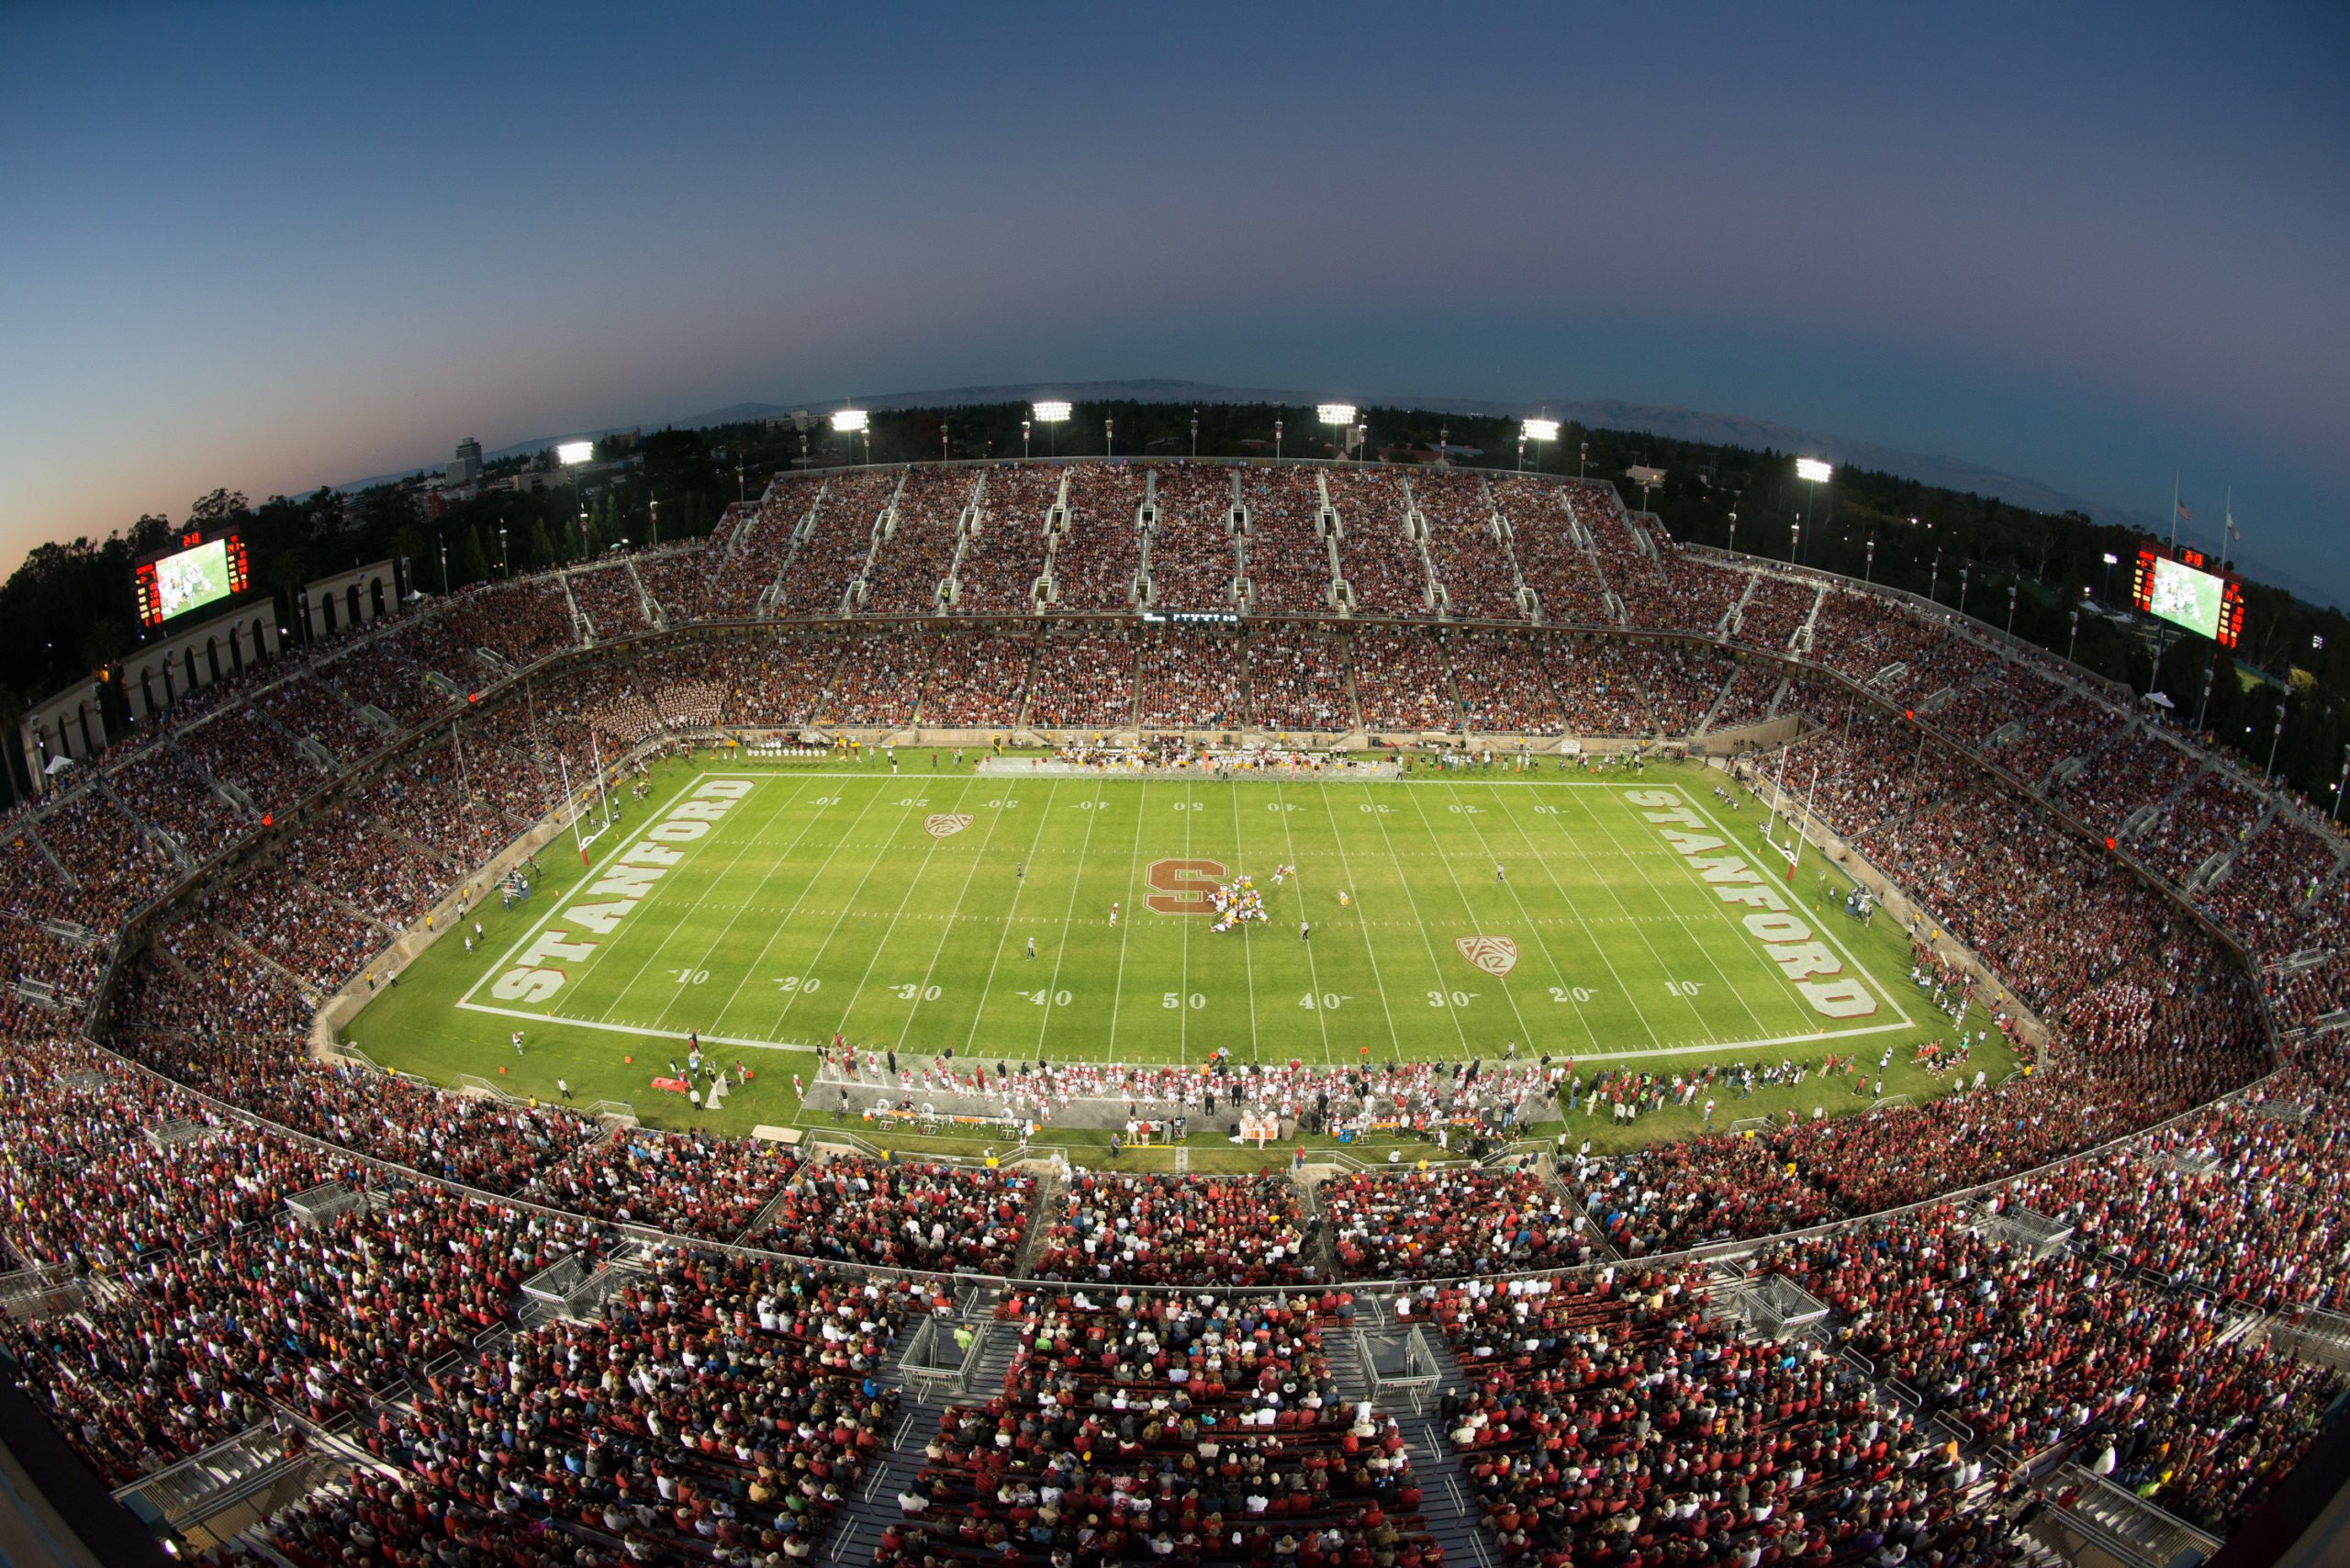 Stanford's football stadium at night..